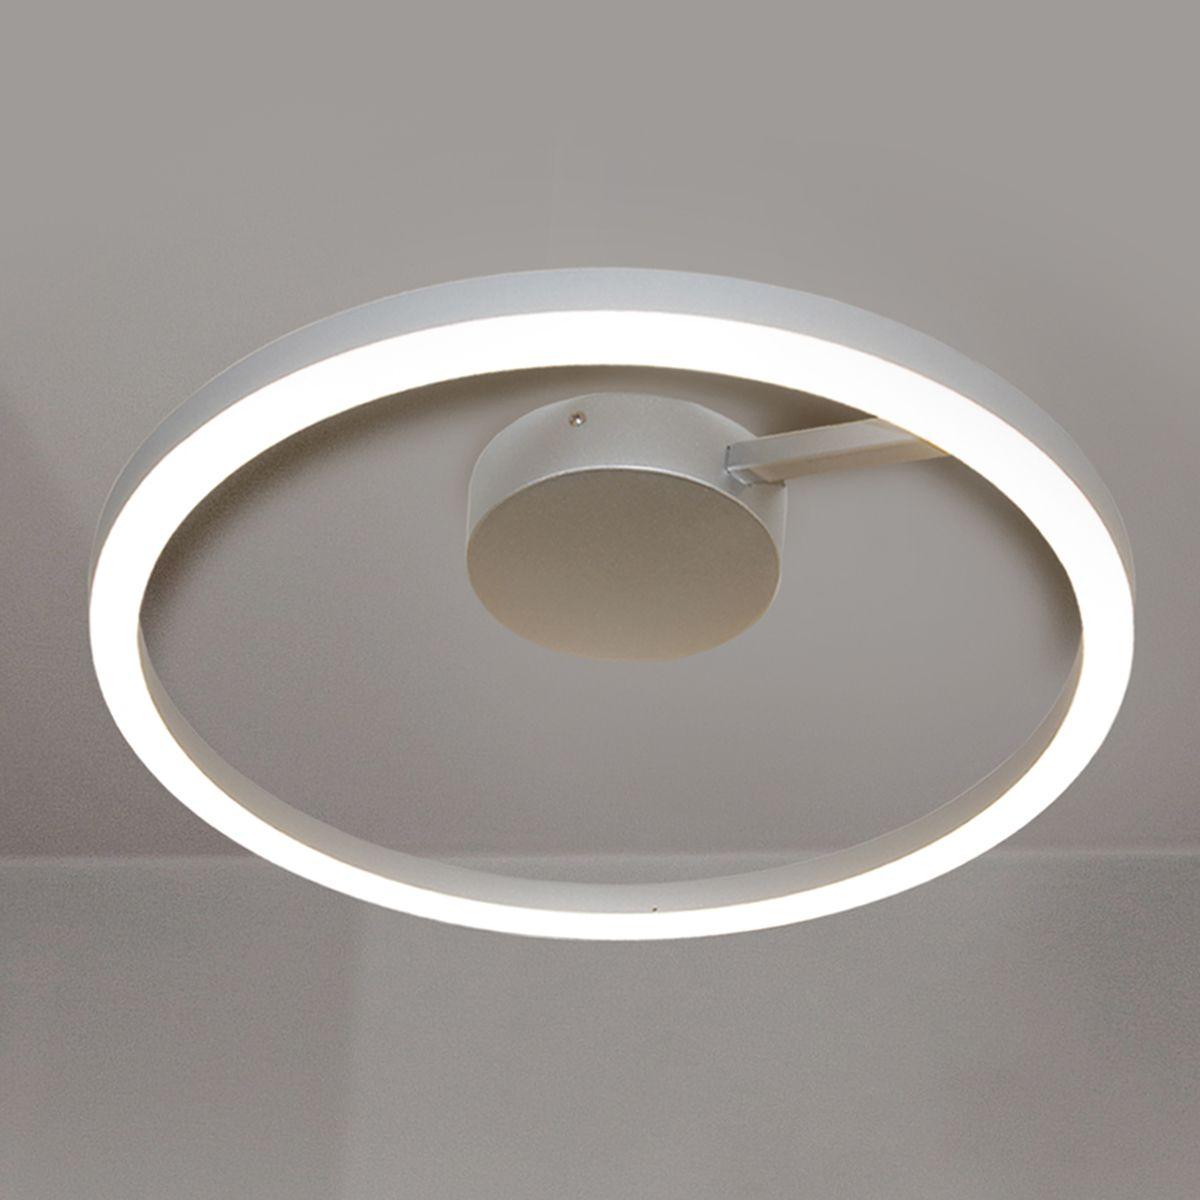 Zuben vmcf41300al 20 led ceiling light modern circular ceiling